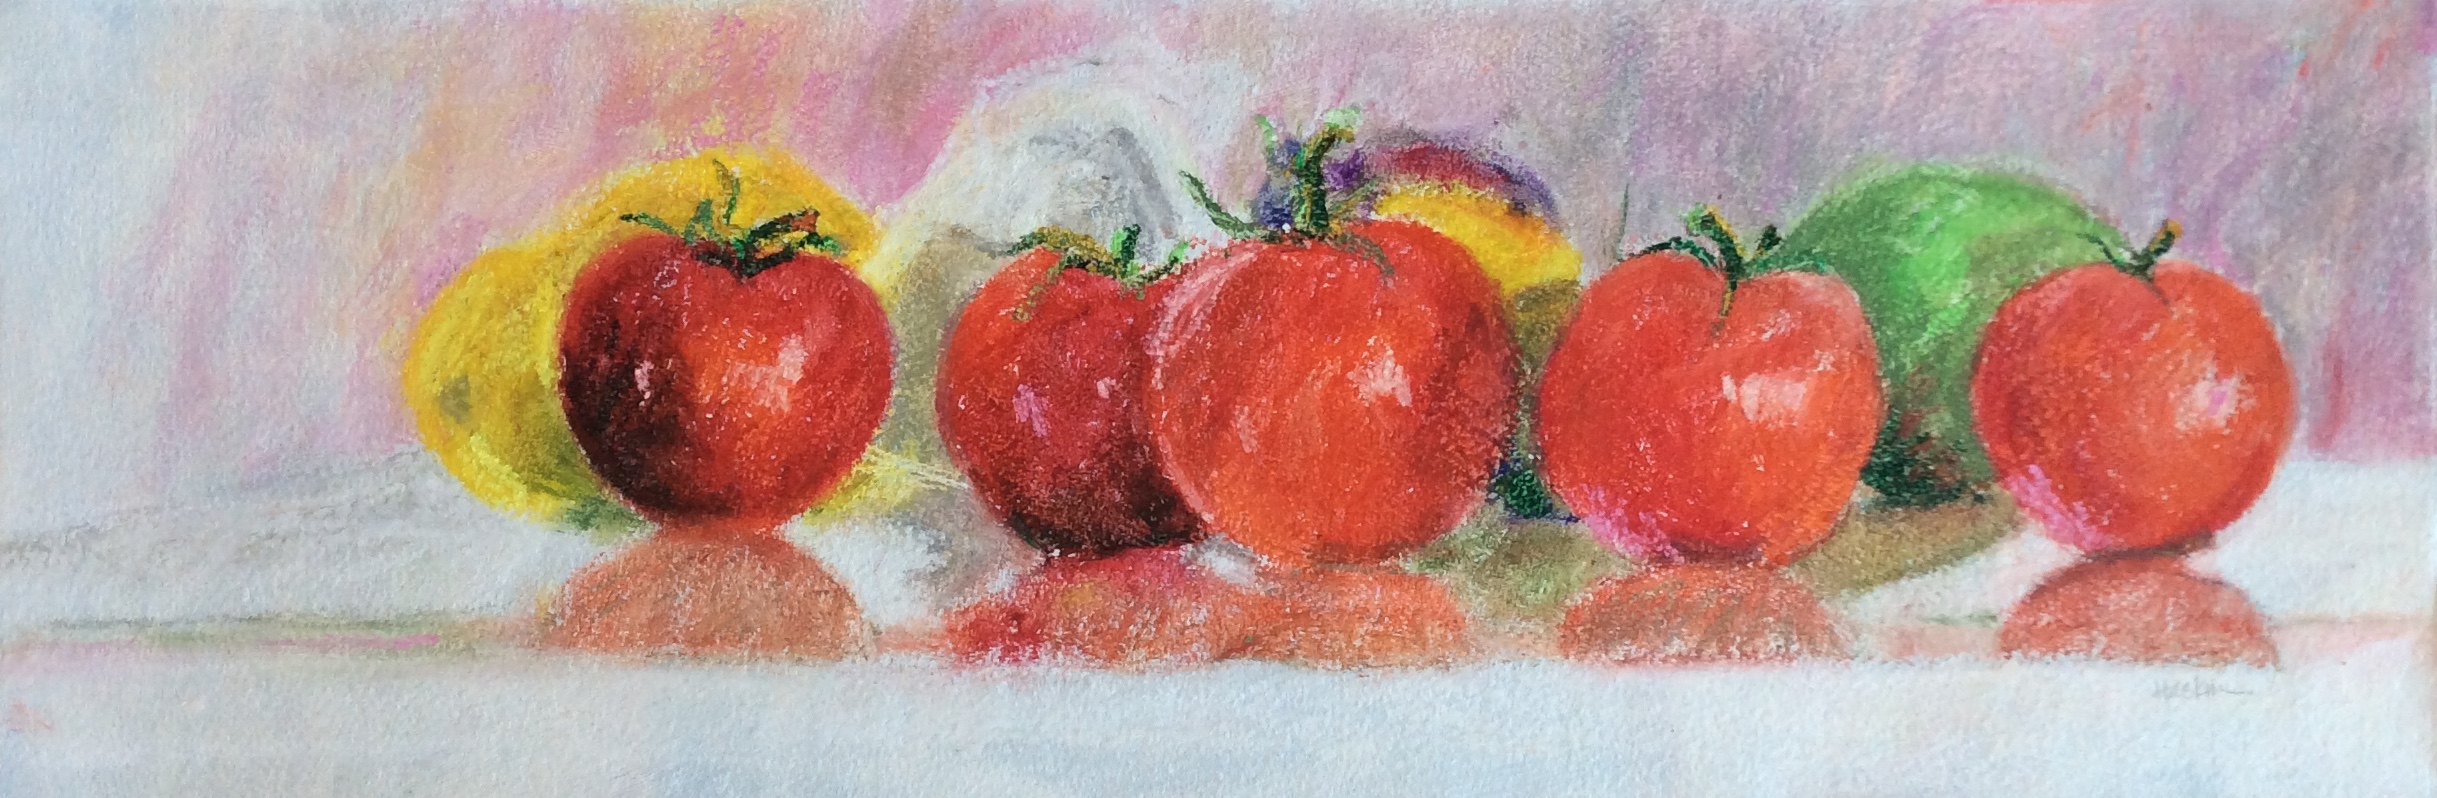 Tomatoes & Lemons